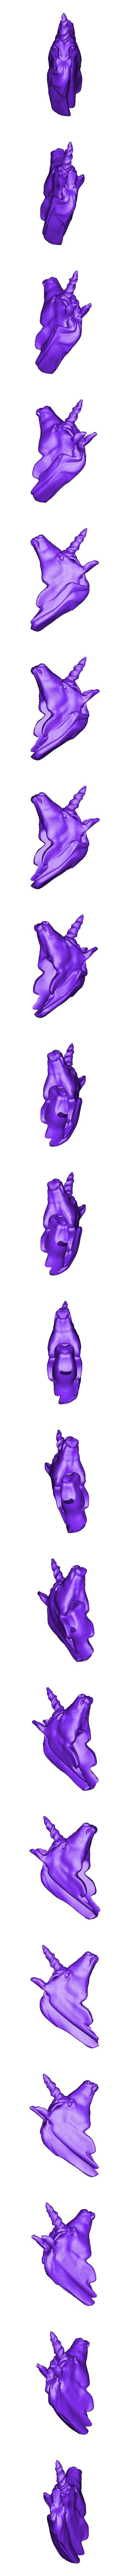 unicorn_sitting_head_with_horn.stl Download free STL file Sitting Unicorn Nightlight • 3D printable object, Pza4Rza